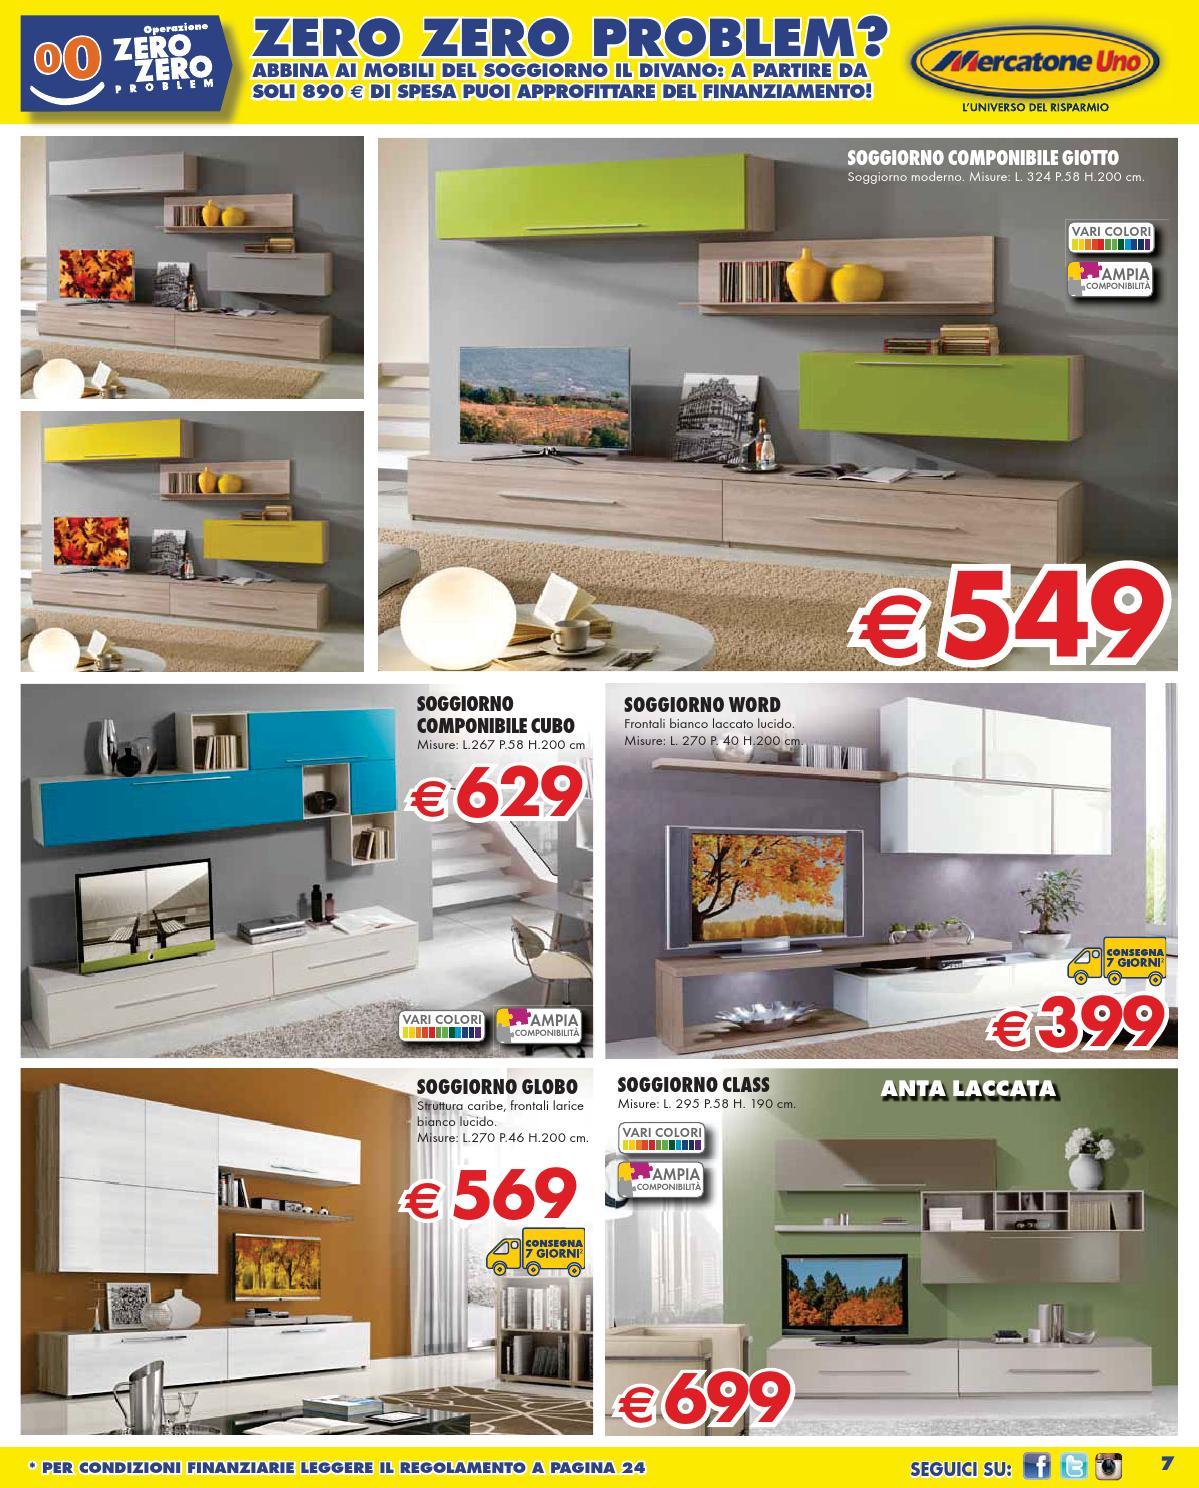 Mercatone uno promo2014 by Mobilpro - issuu